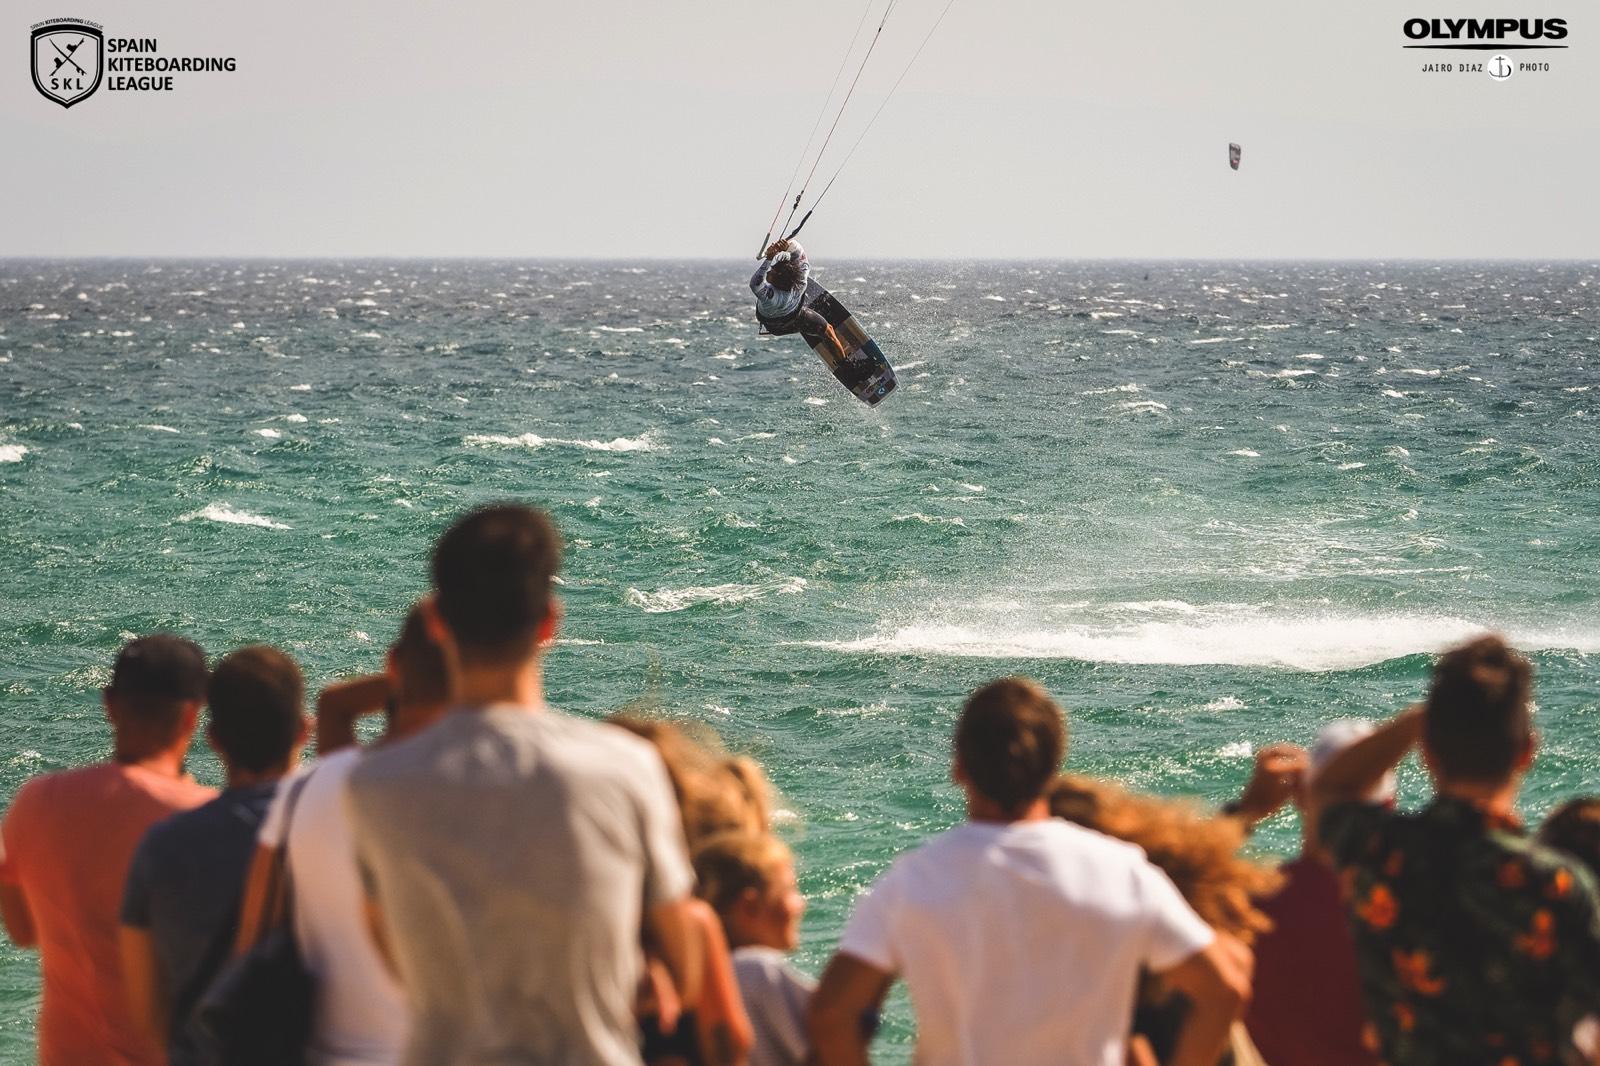 galeria-spain-kiteboarding-league-2018-6